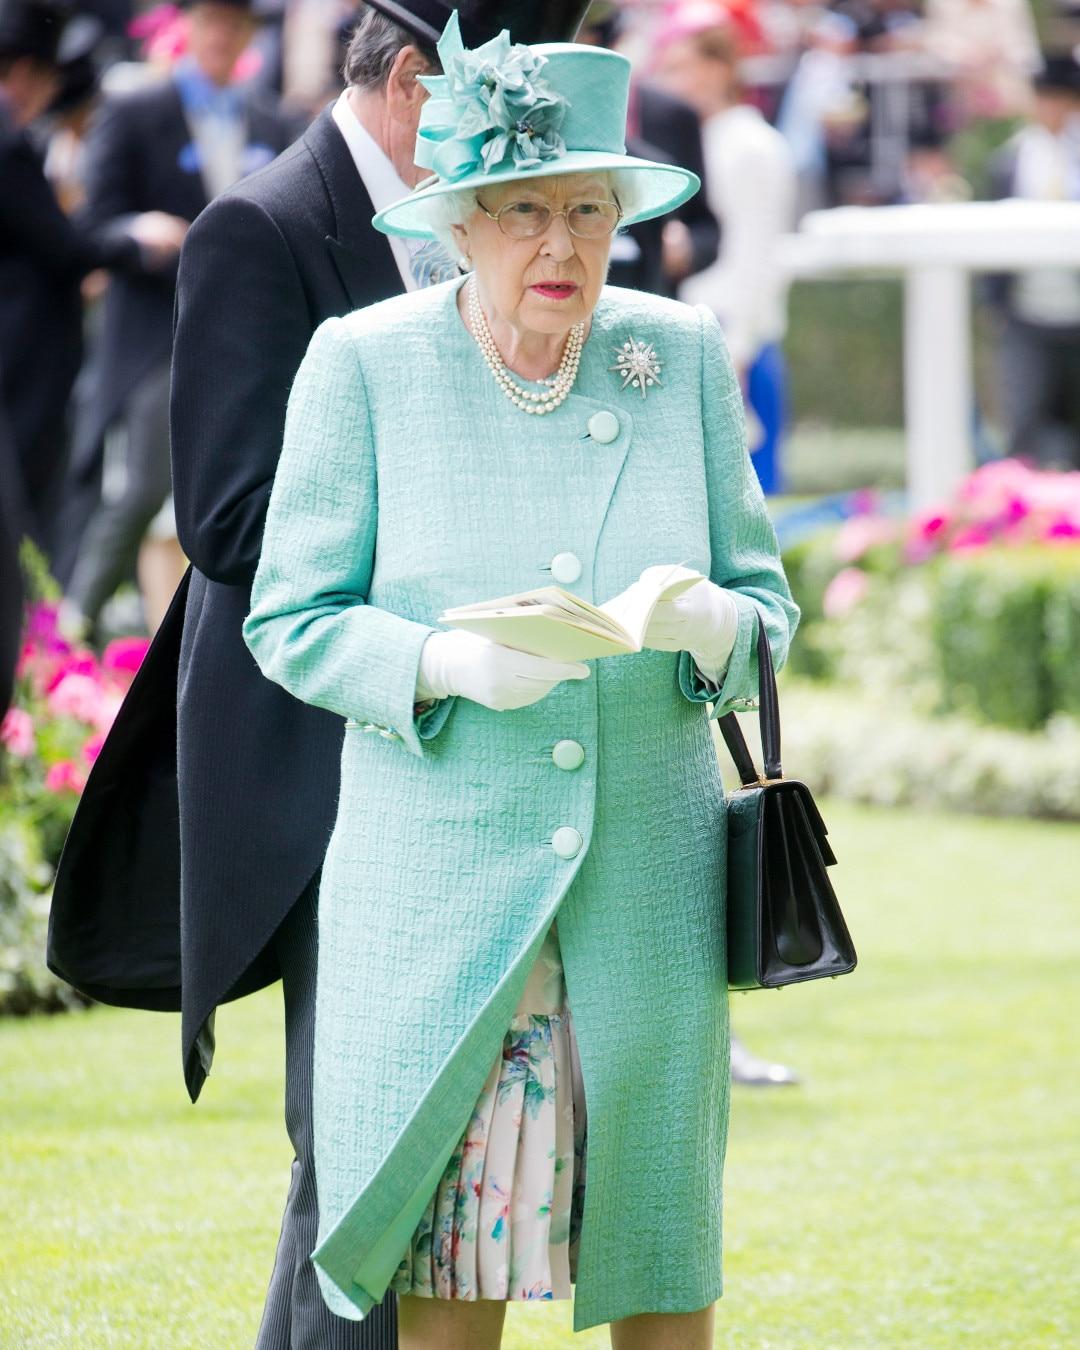 ESC: Do's and Dont's, Queen Elizabeth II, Monochrome